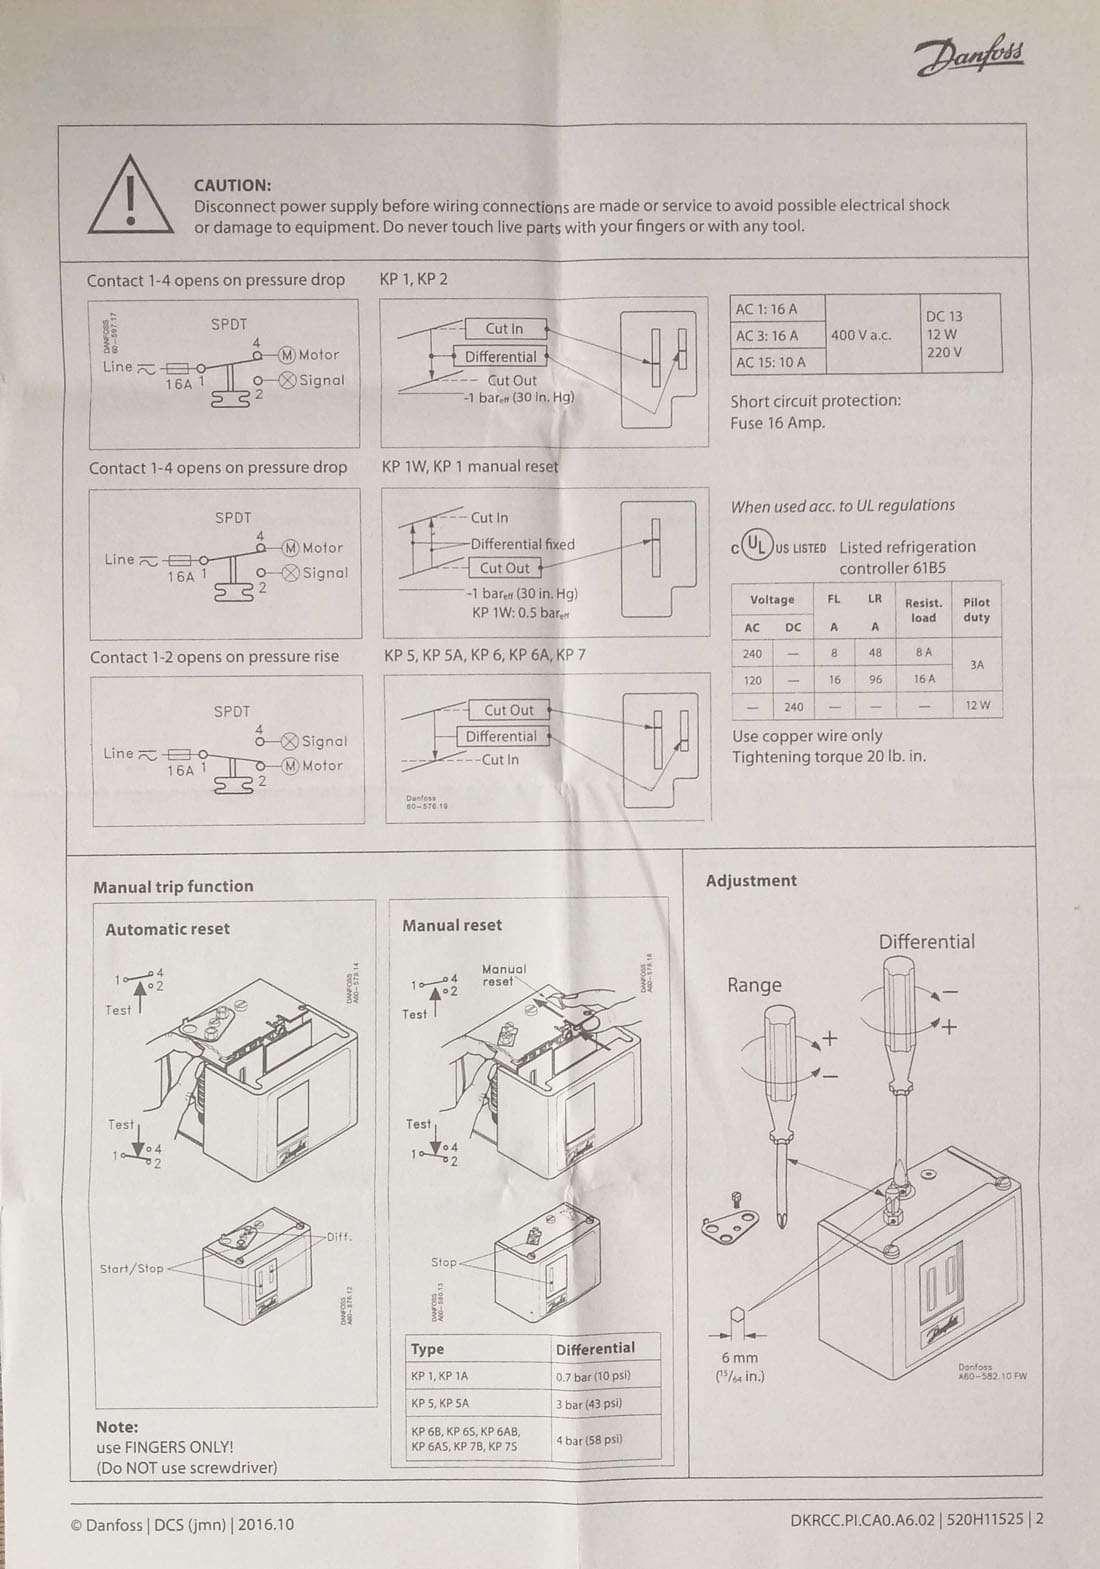 Danfoss pressure controls switches(KP1 KP2 KP5) 1